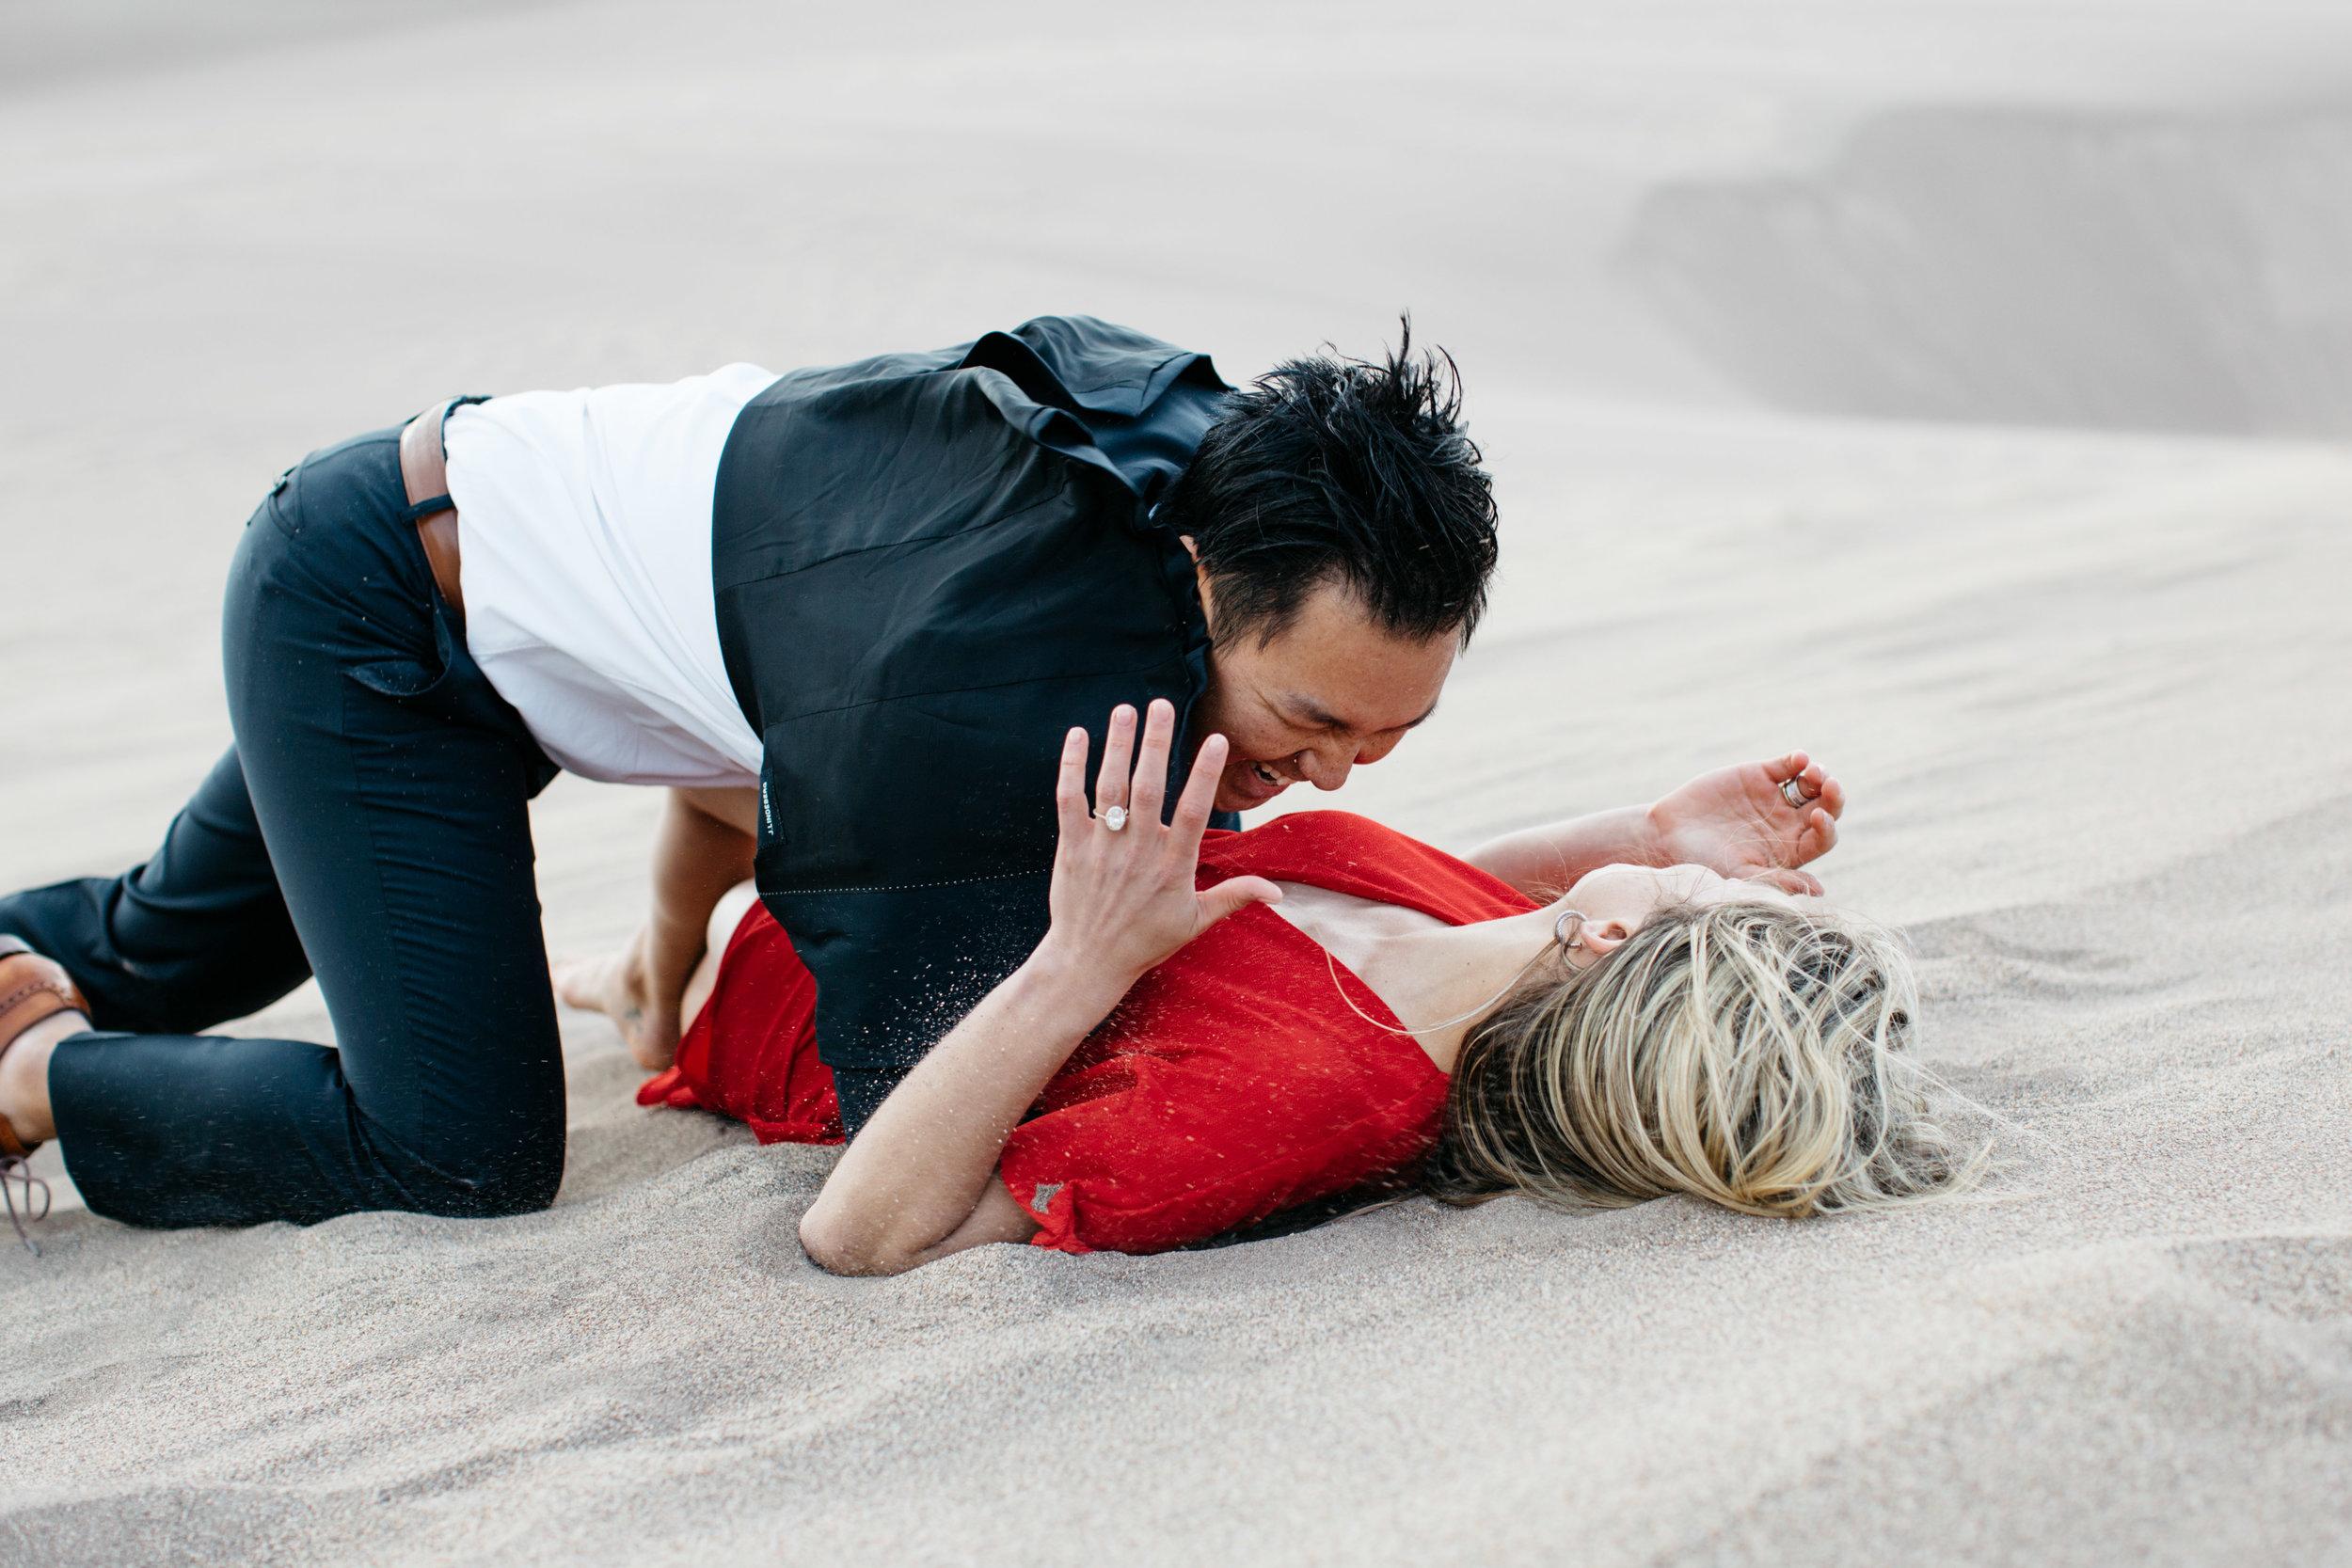 colorado-sand-dunes-engagement-photography-6.jpg